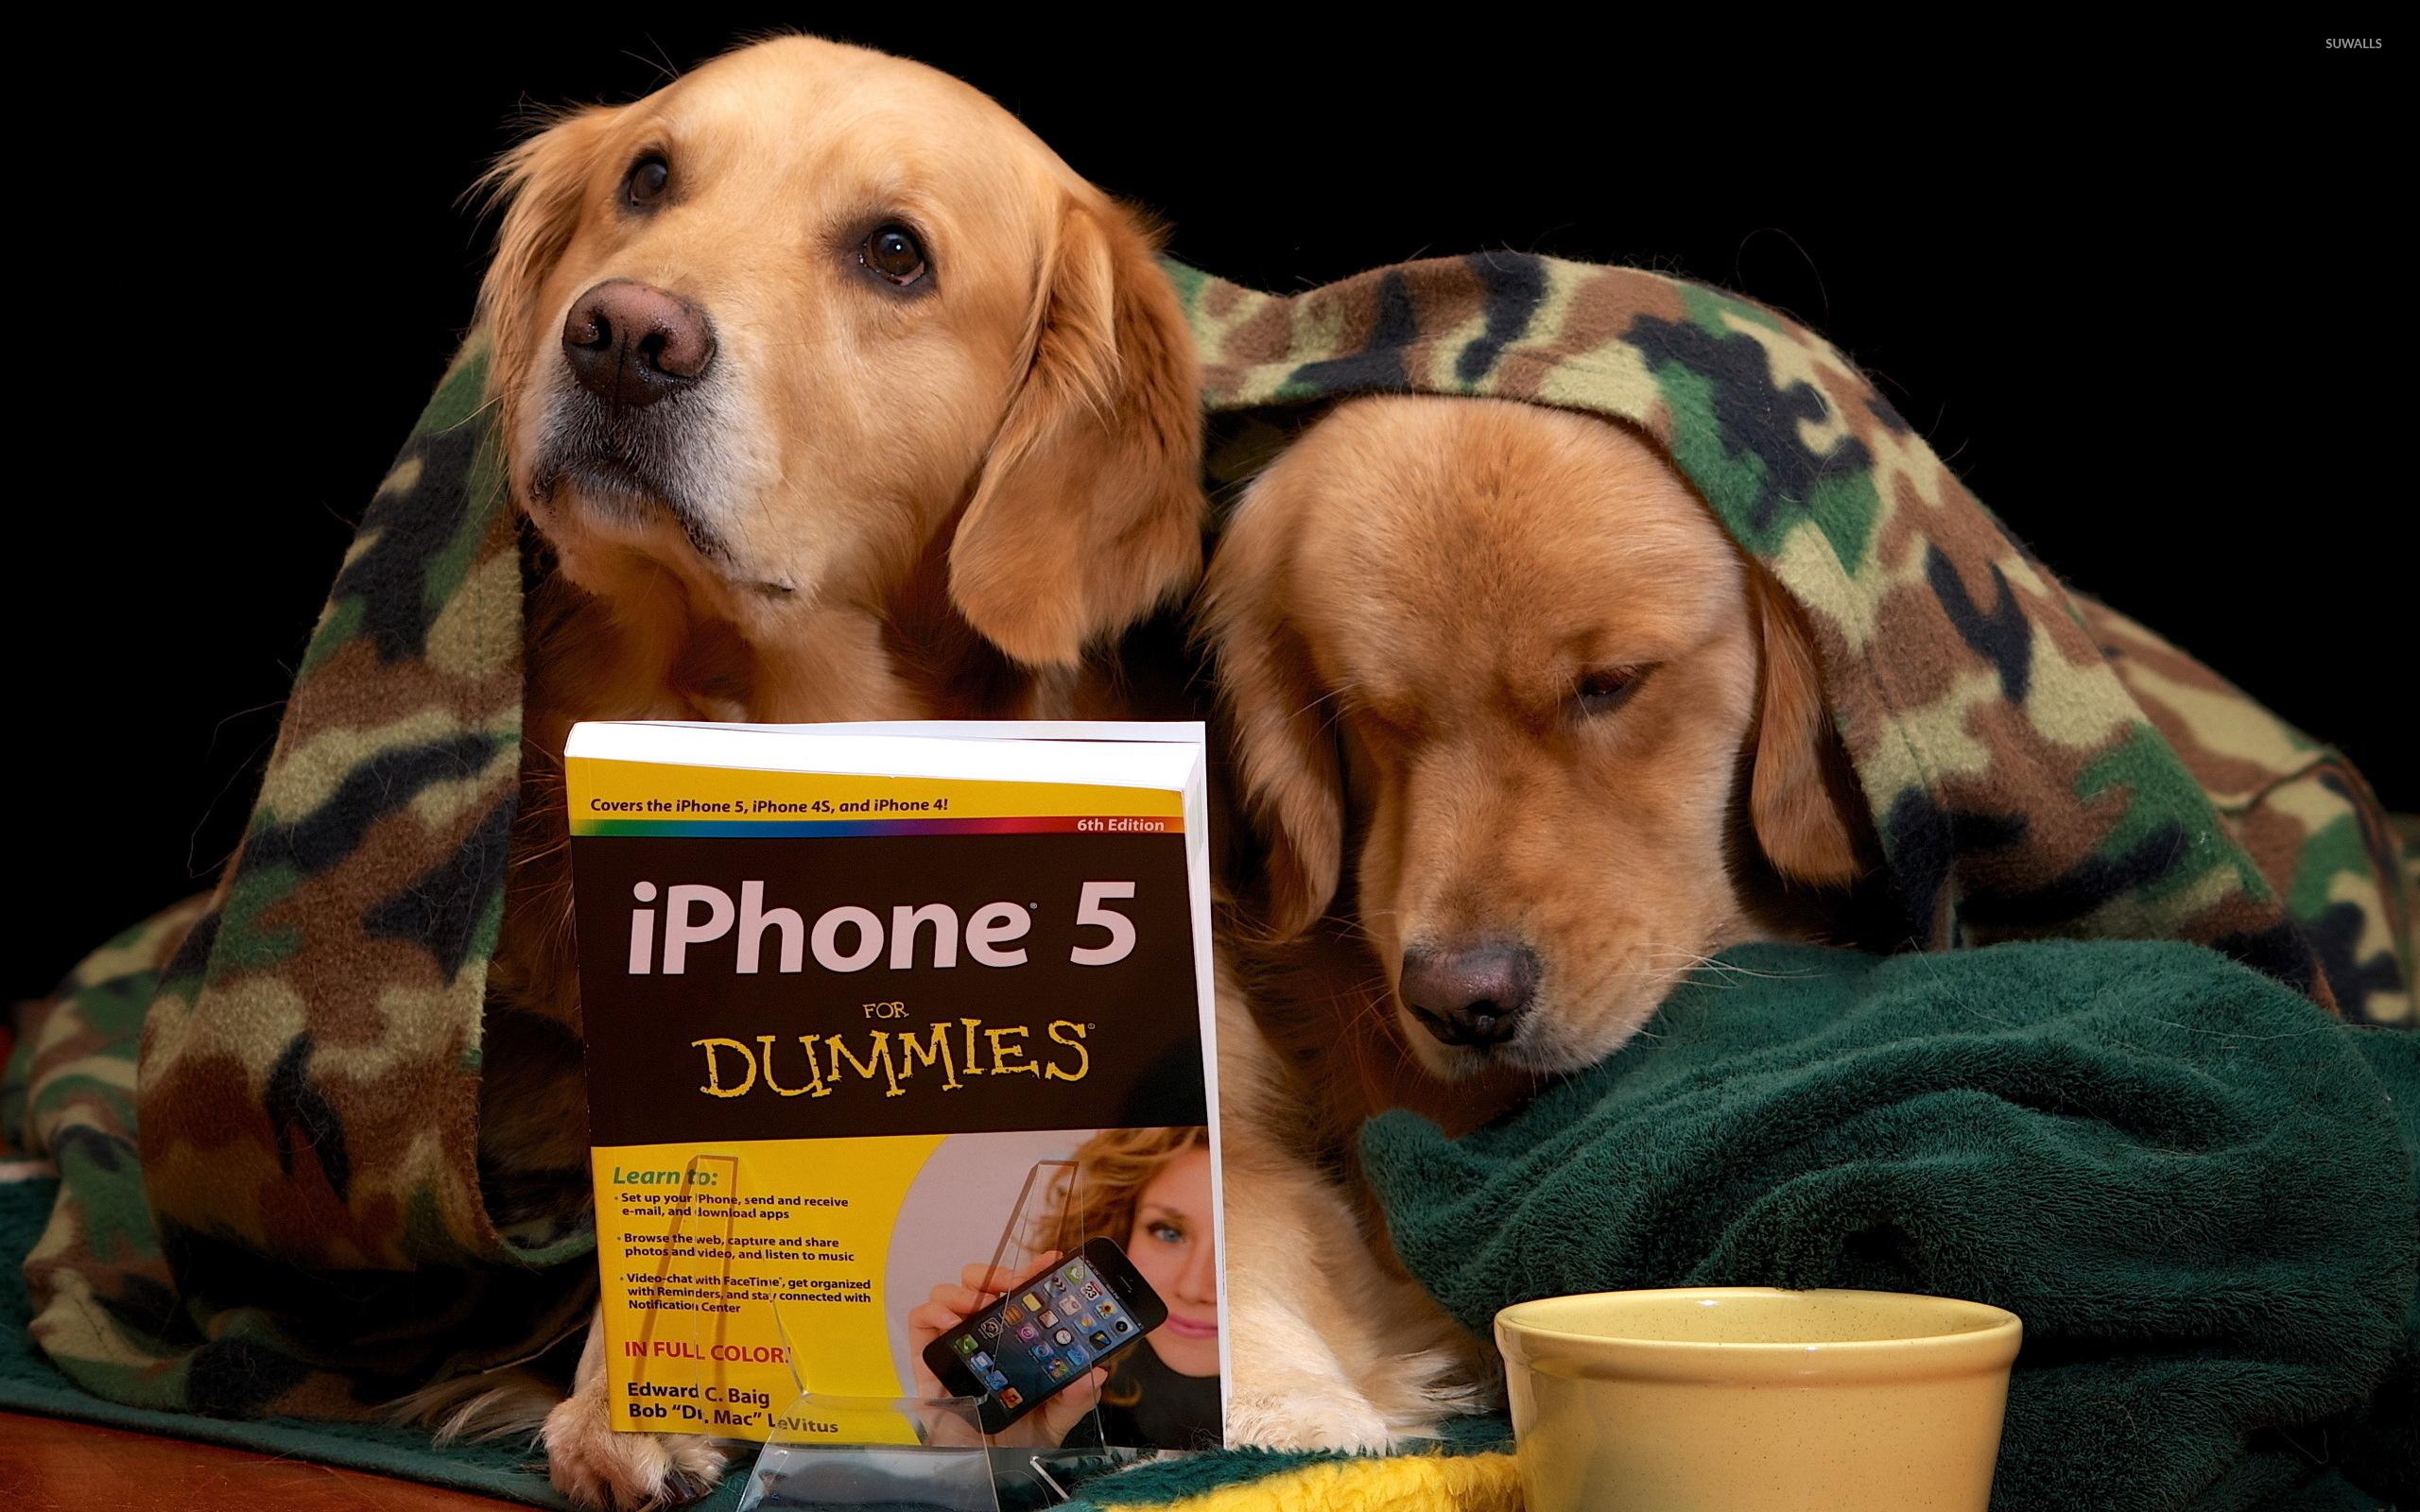 Golden Retriever Puppies Learning Wallpaper Animal